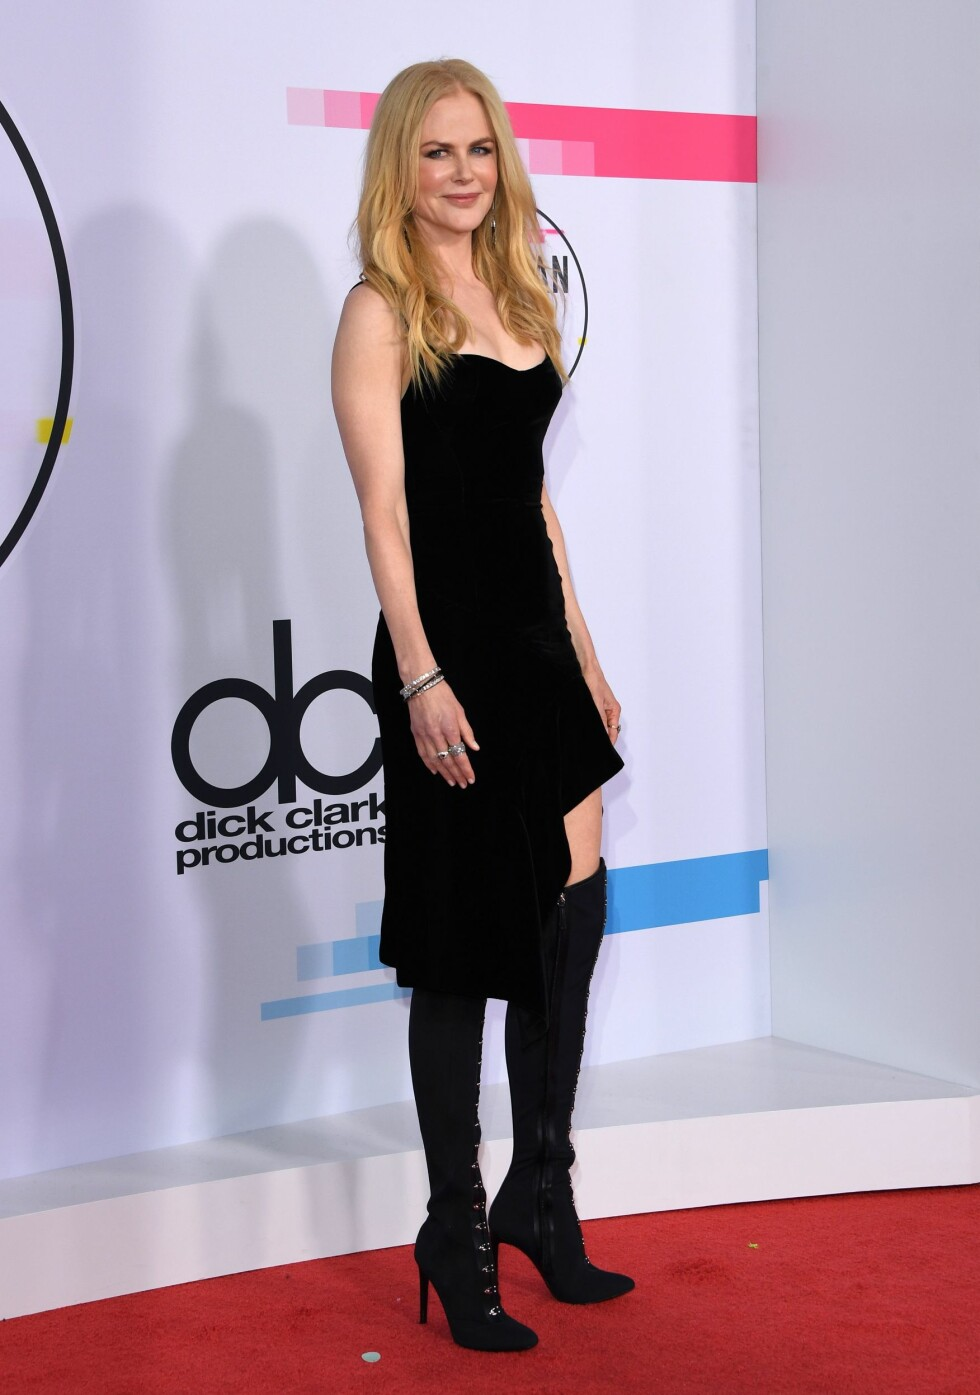 AMERICAN MUSIC AWARDS: Nicole Kidman